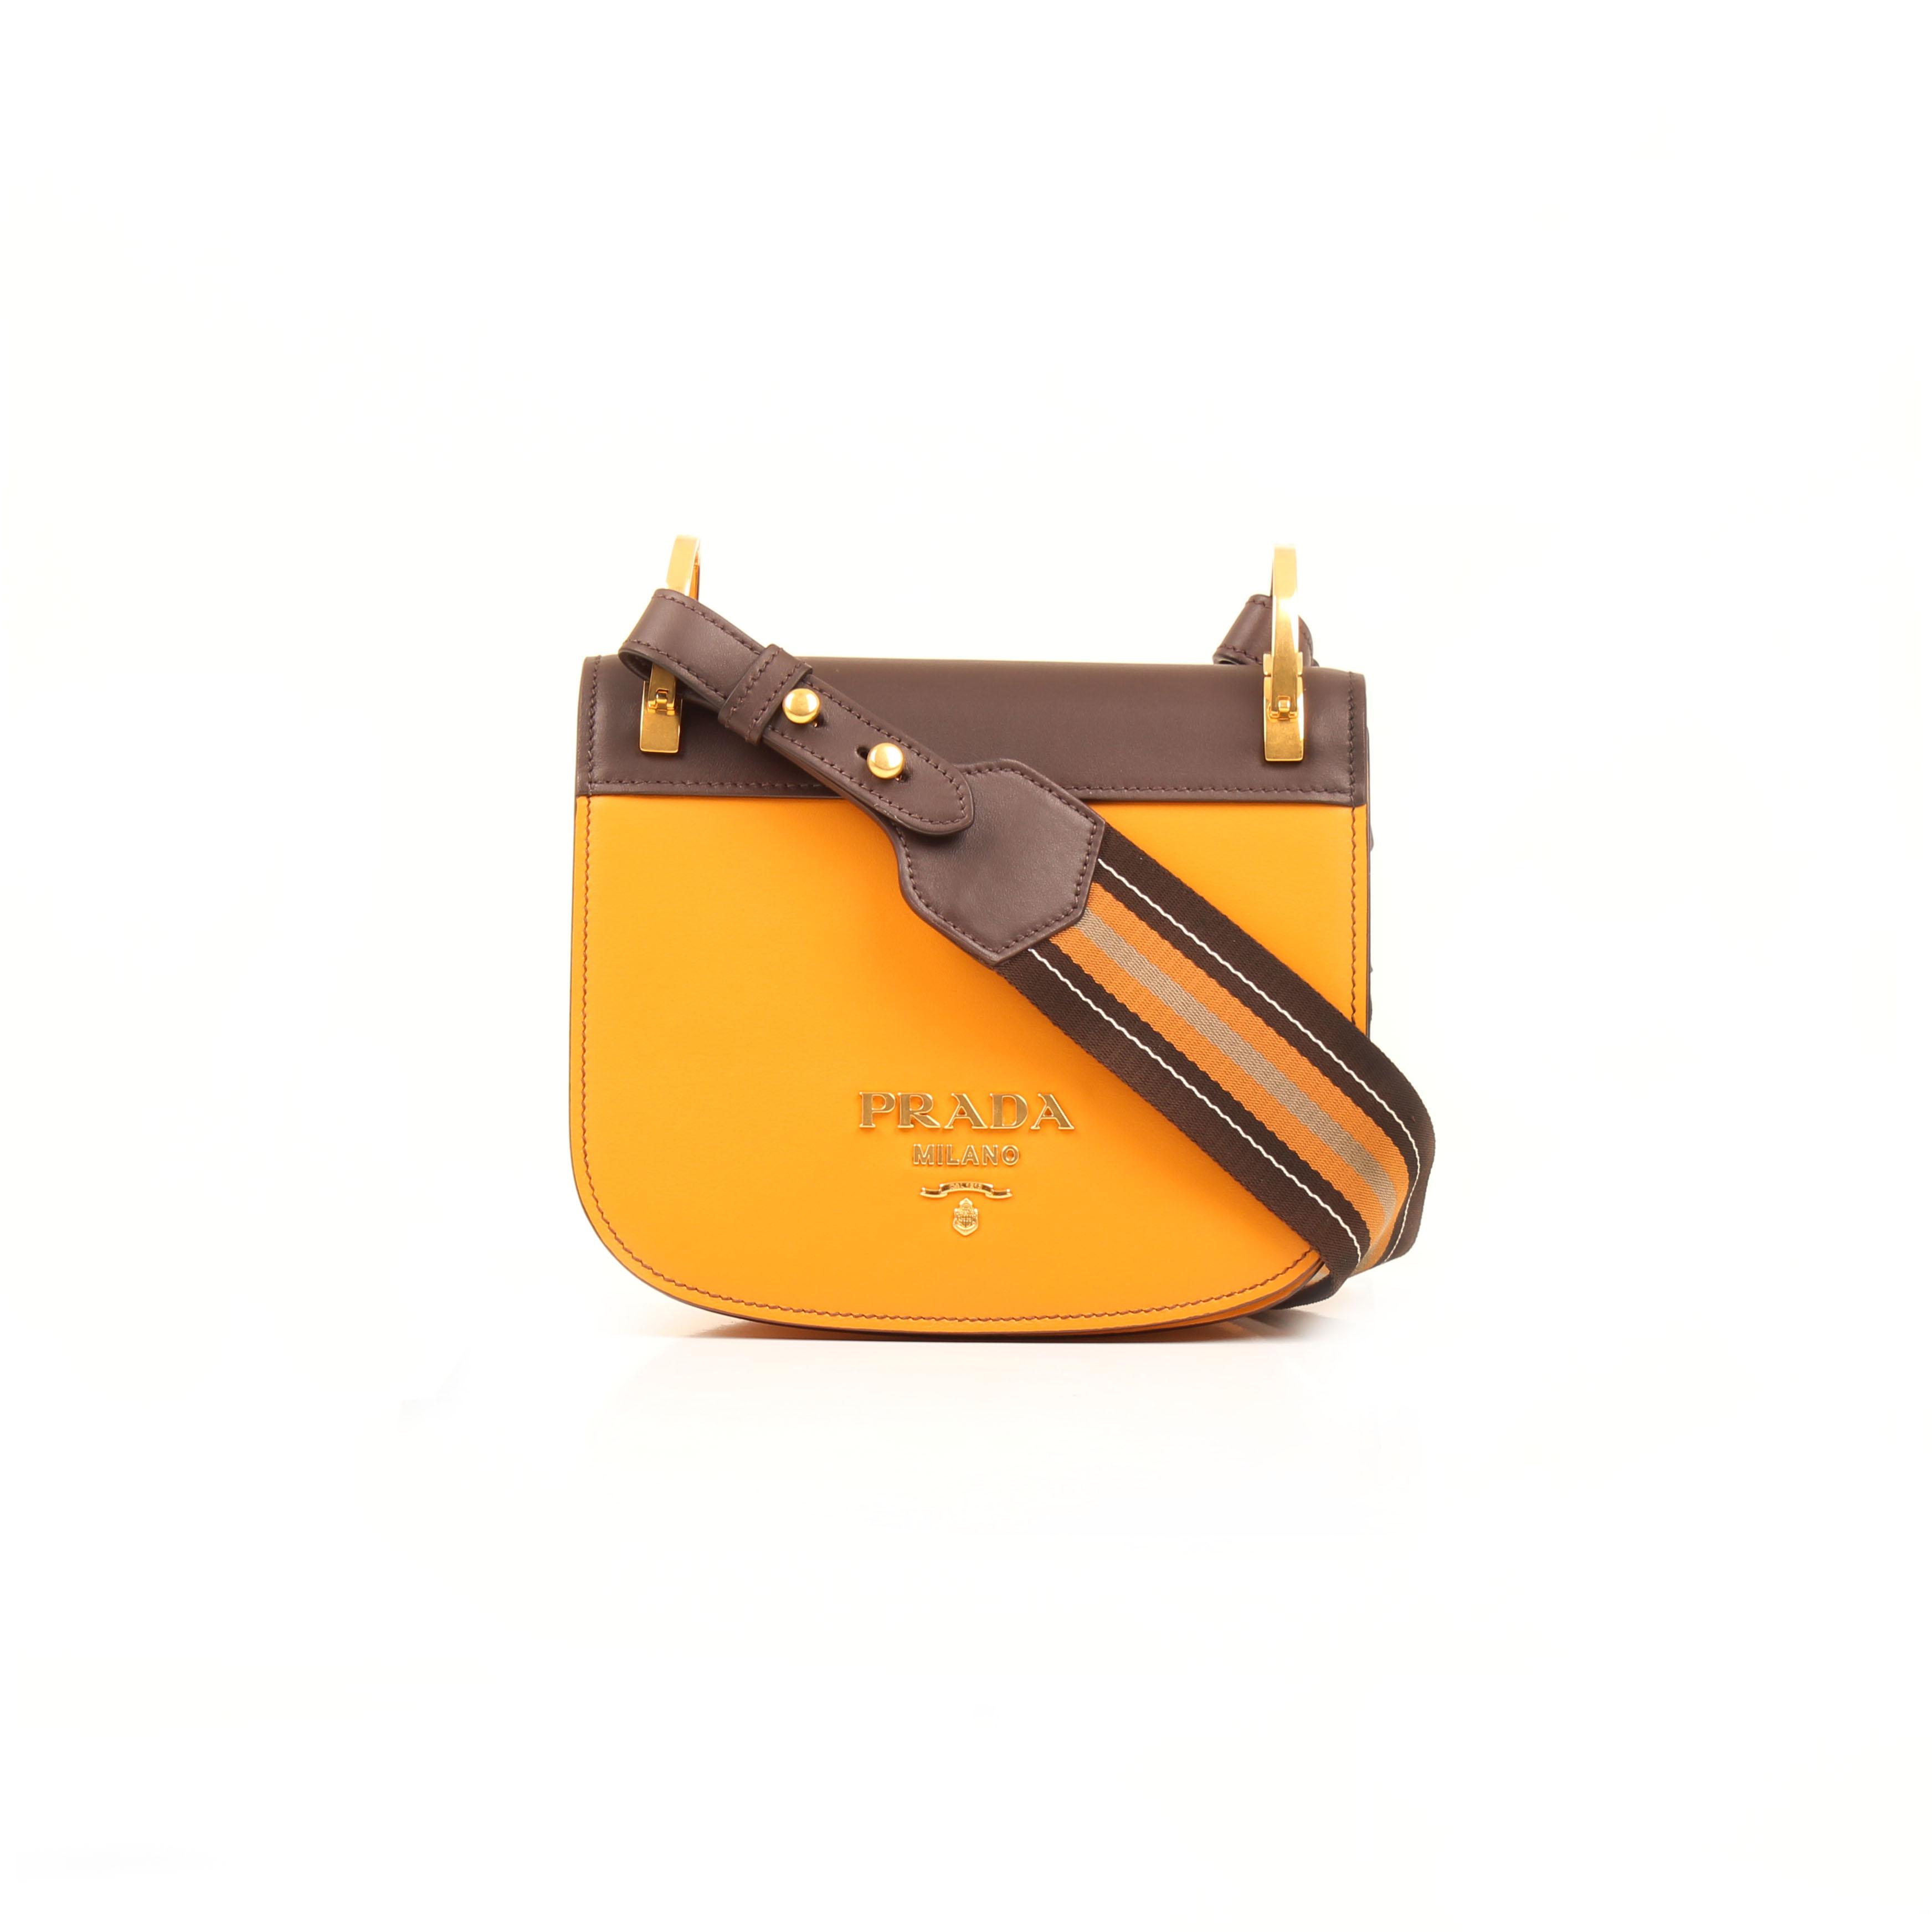 173c39e3aaadff Prada Bag Pionnière Bicolor City Calf Leather Shoulder Bag I CBL Bags